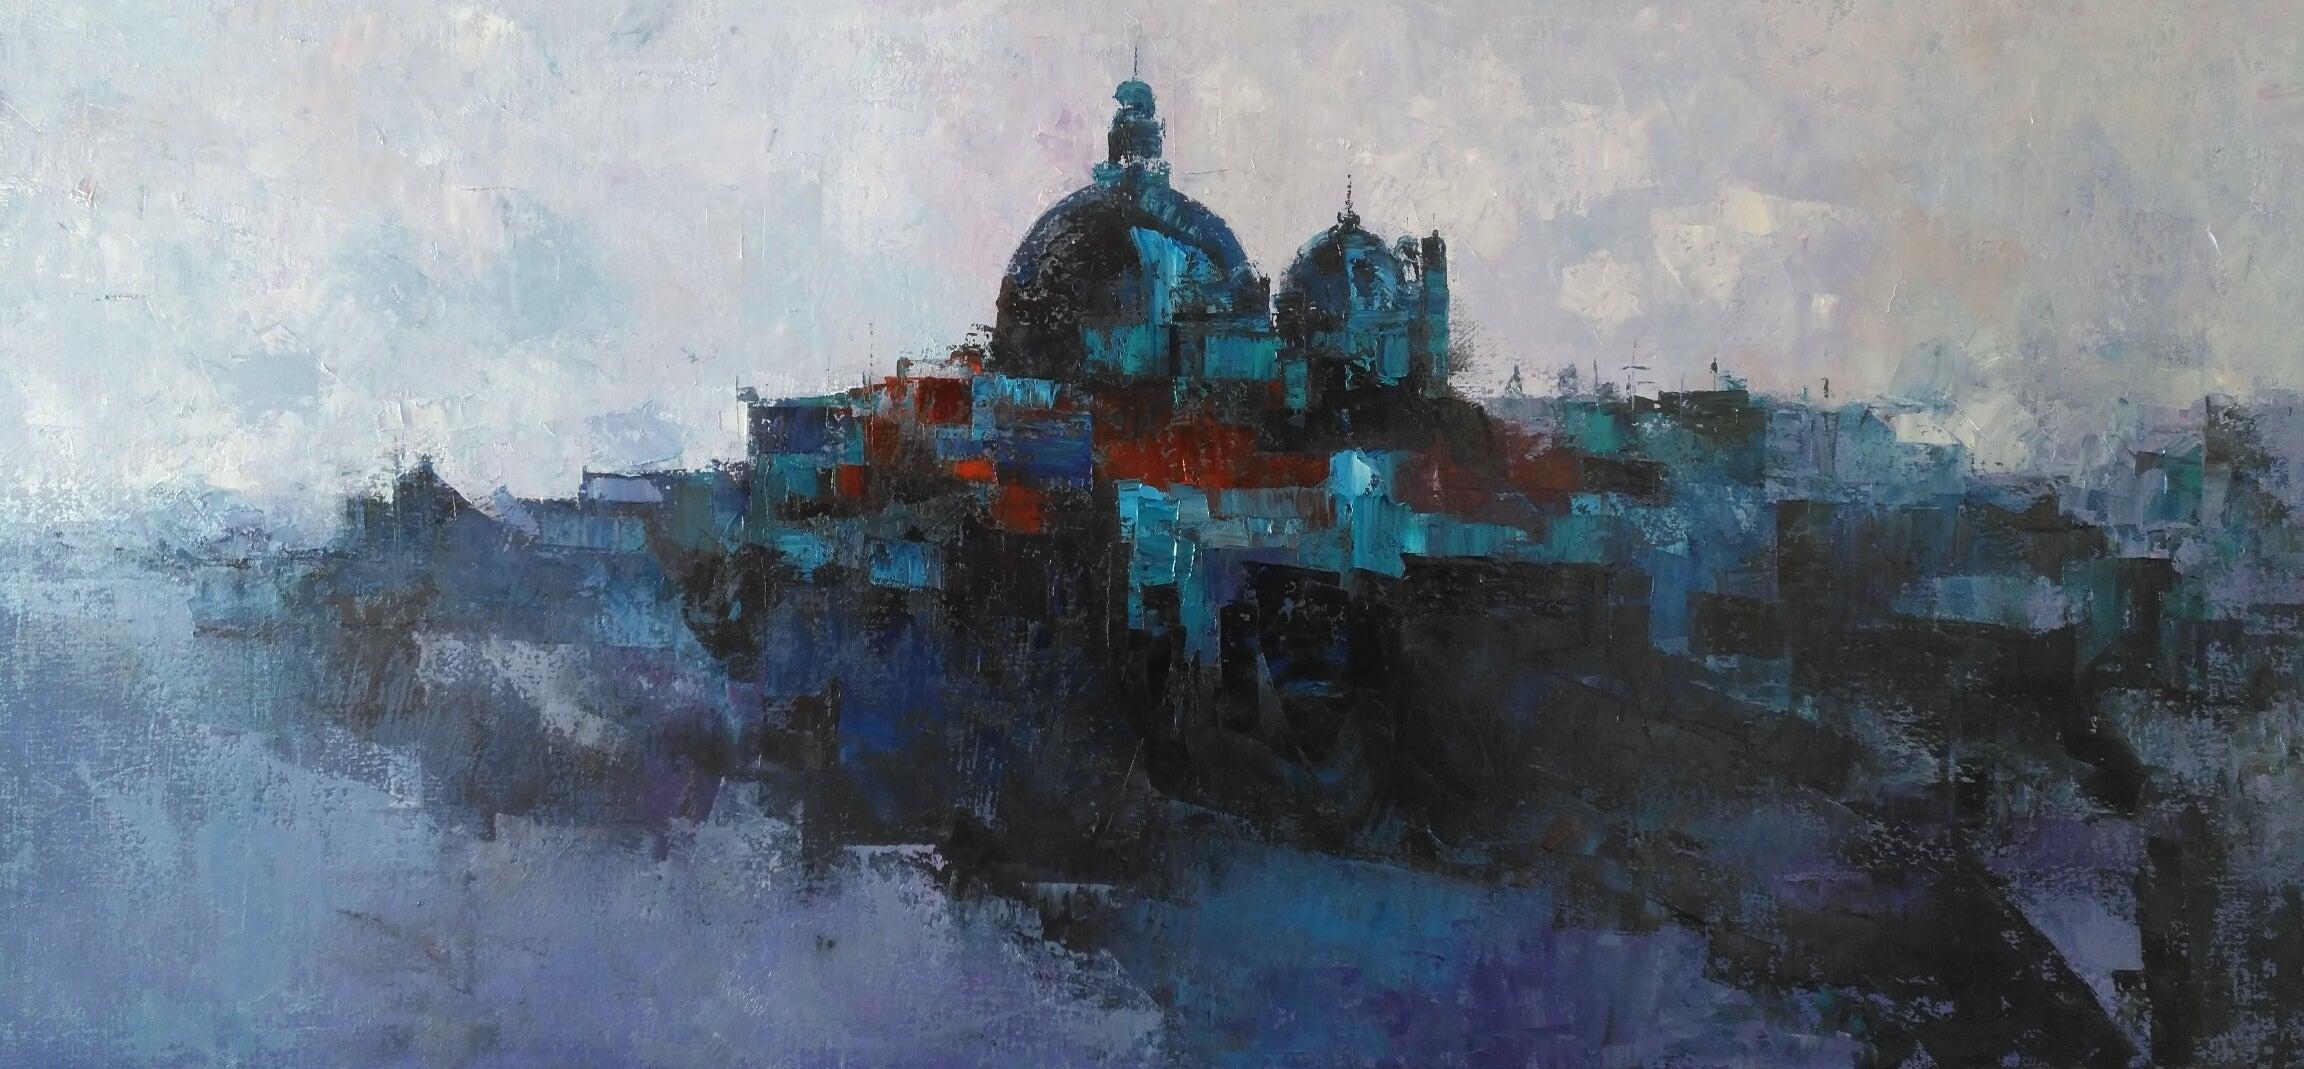 La Salute - 21st Century, Contemporary, Landscape, Oil on Canvas